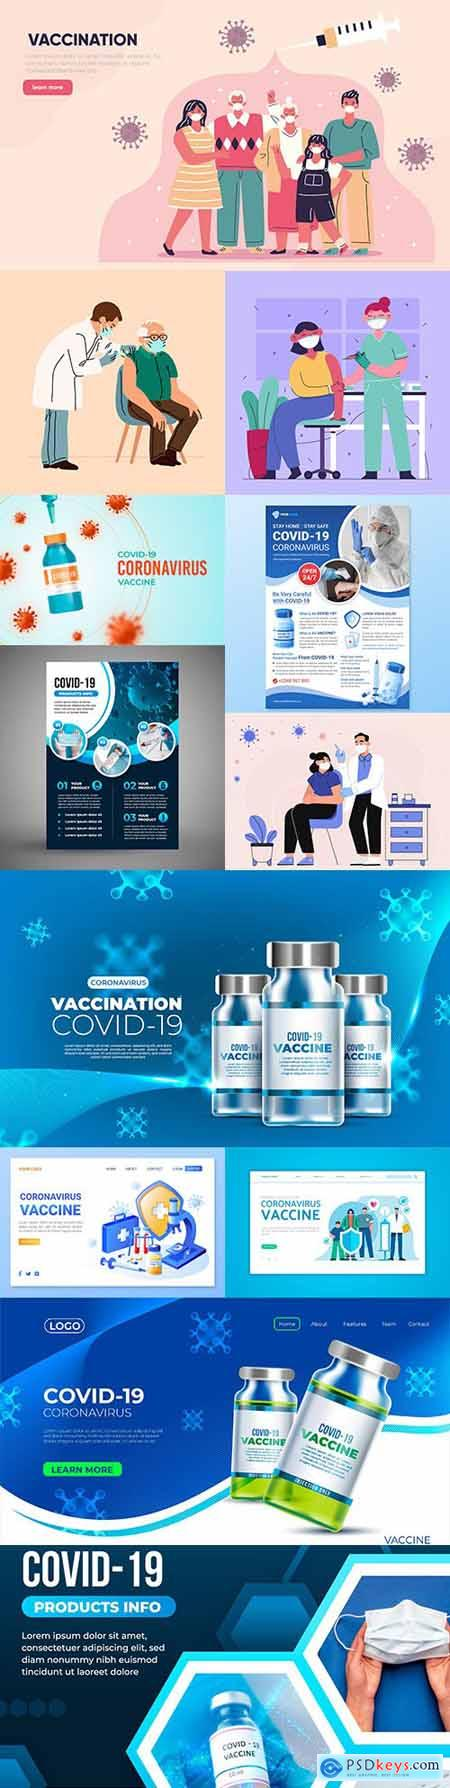 Coronavirus vaccine doctor and patient design illustration